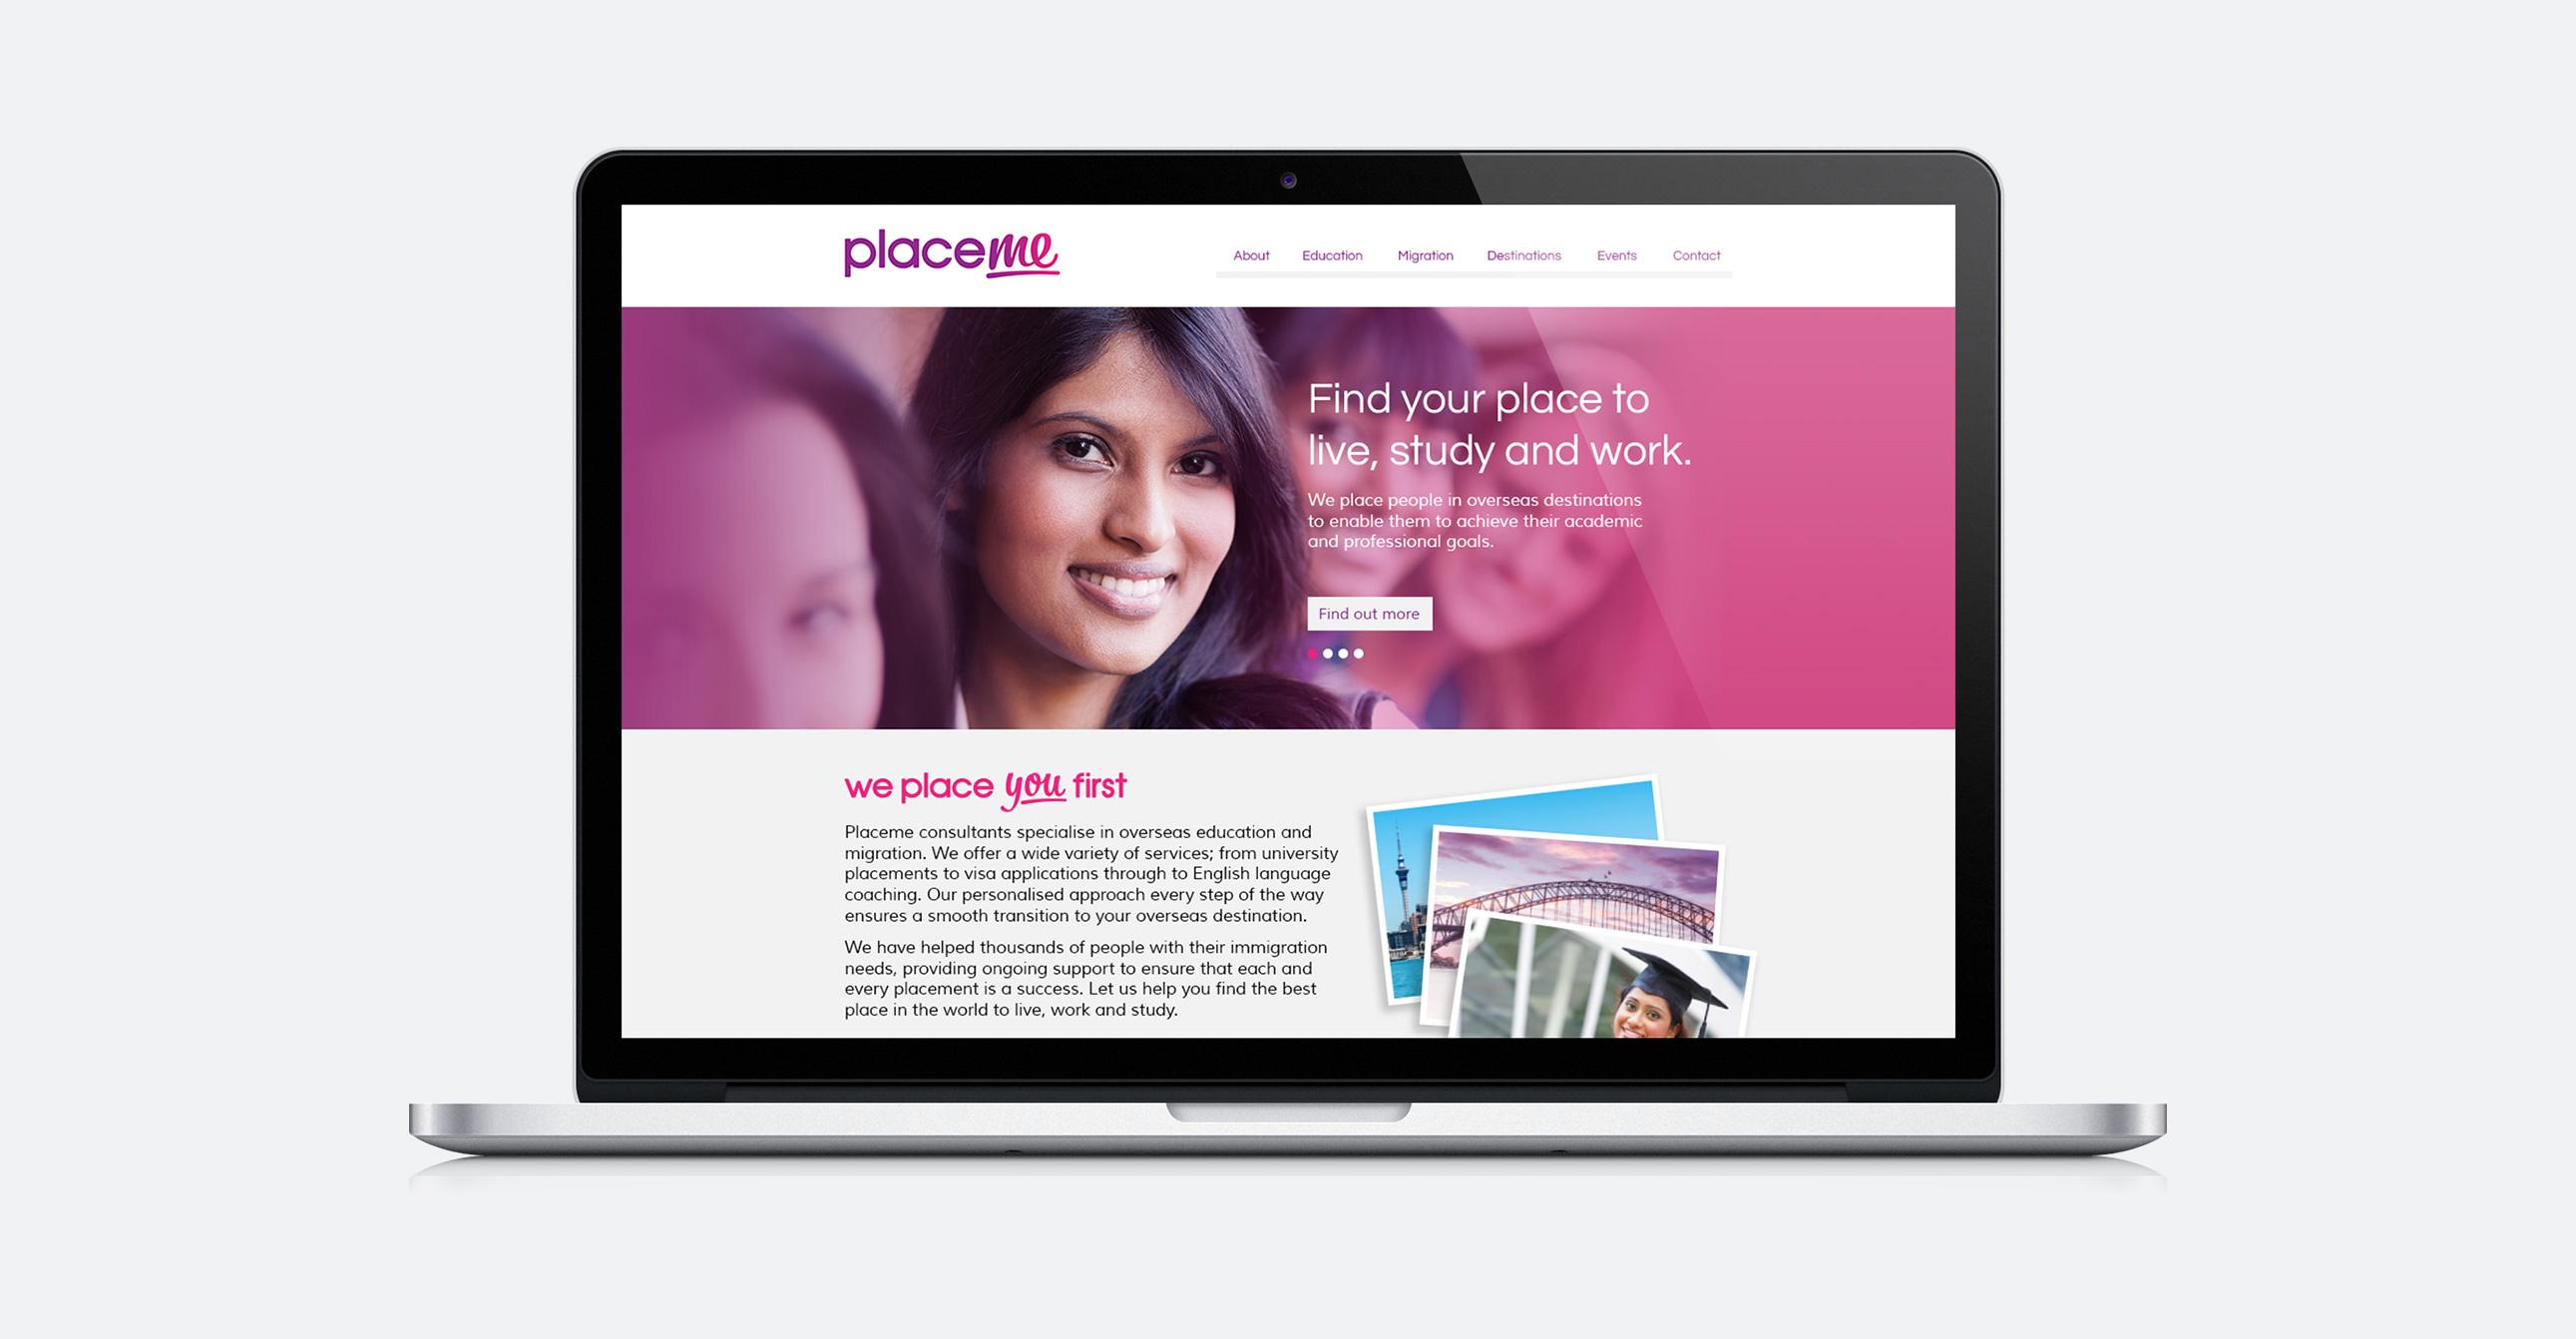 placeme_5.jpg